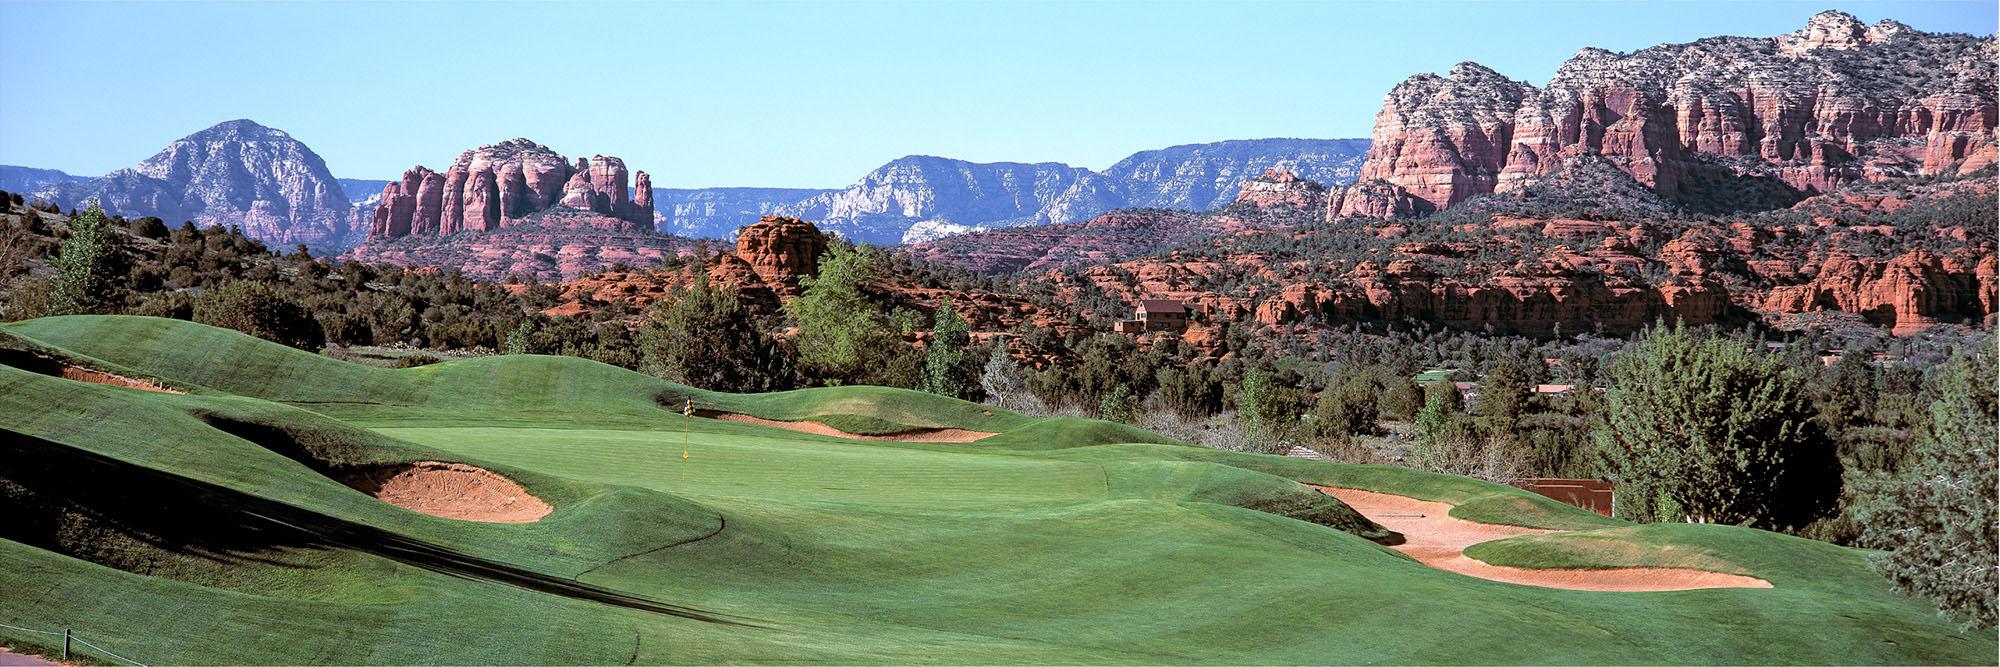 Golf Course Image - Sedona No. 10